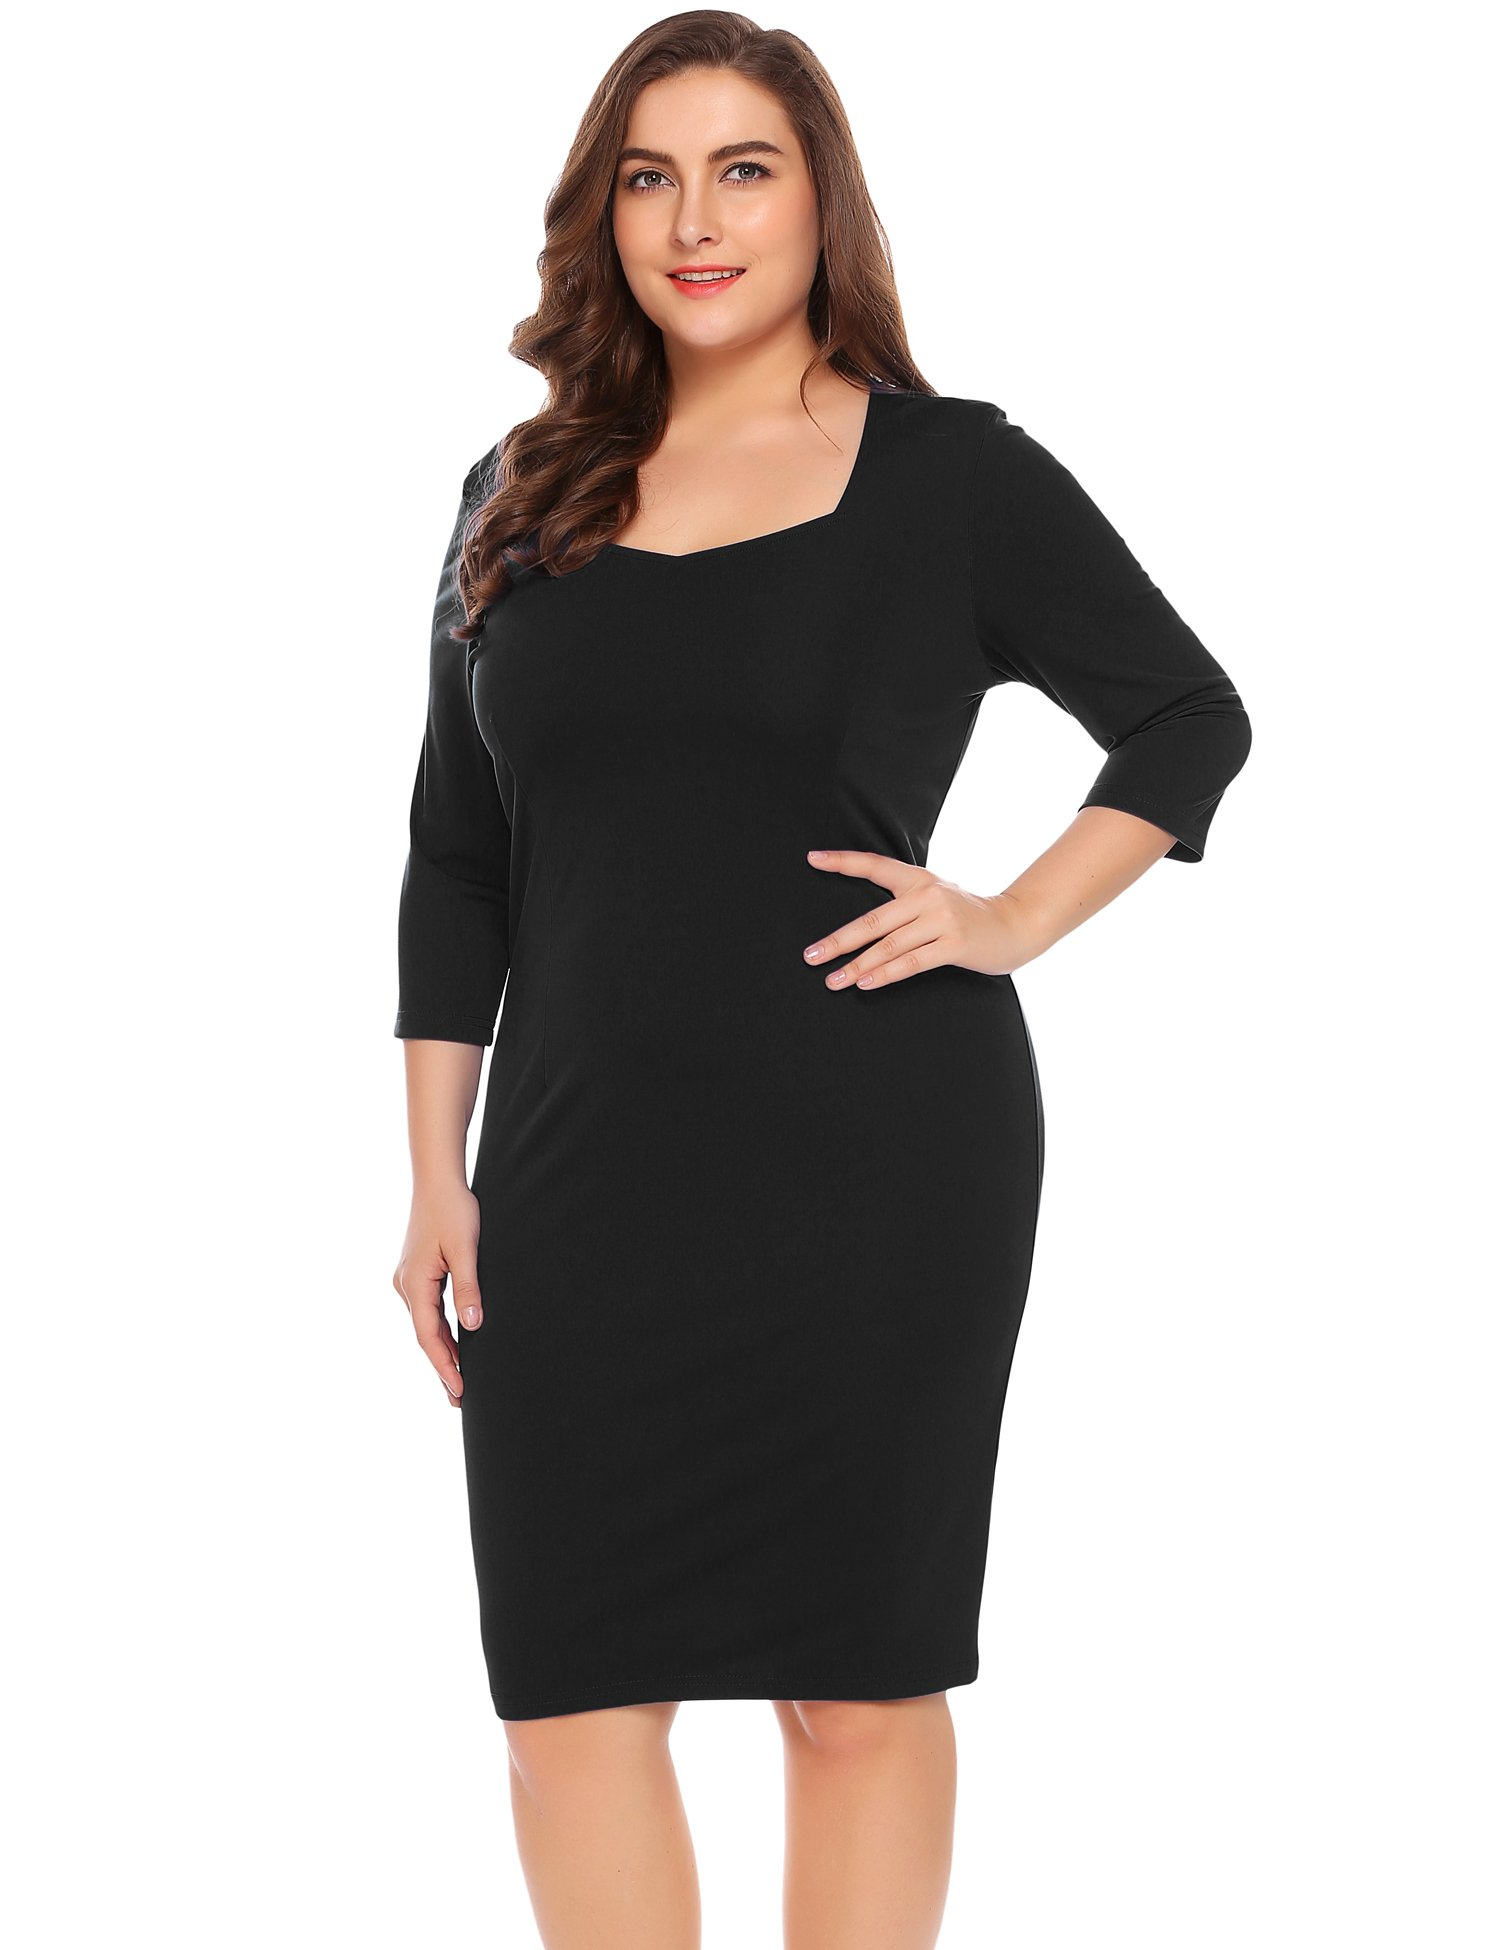 IN'VOLAND Women's Plus Size Sweetheart Neck 3/4 Sleeve Pencil Dress, Black, 20 Plus